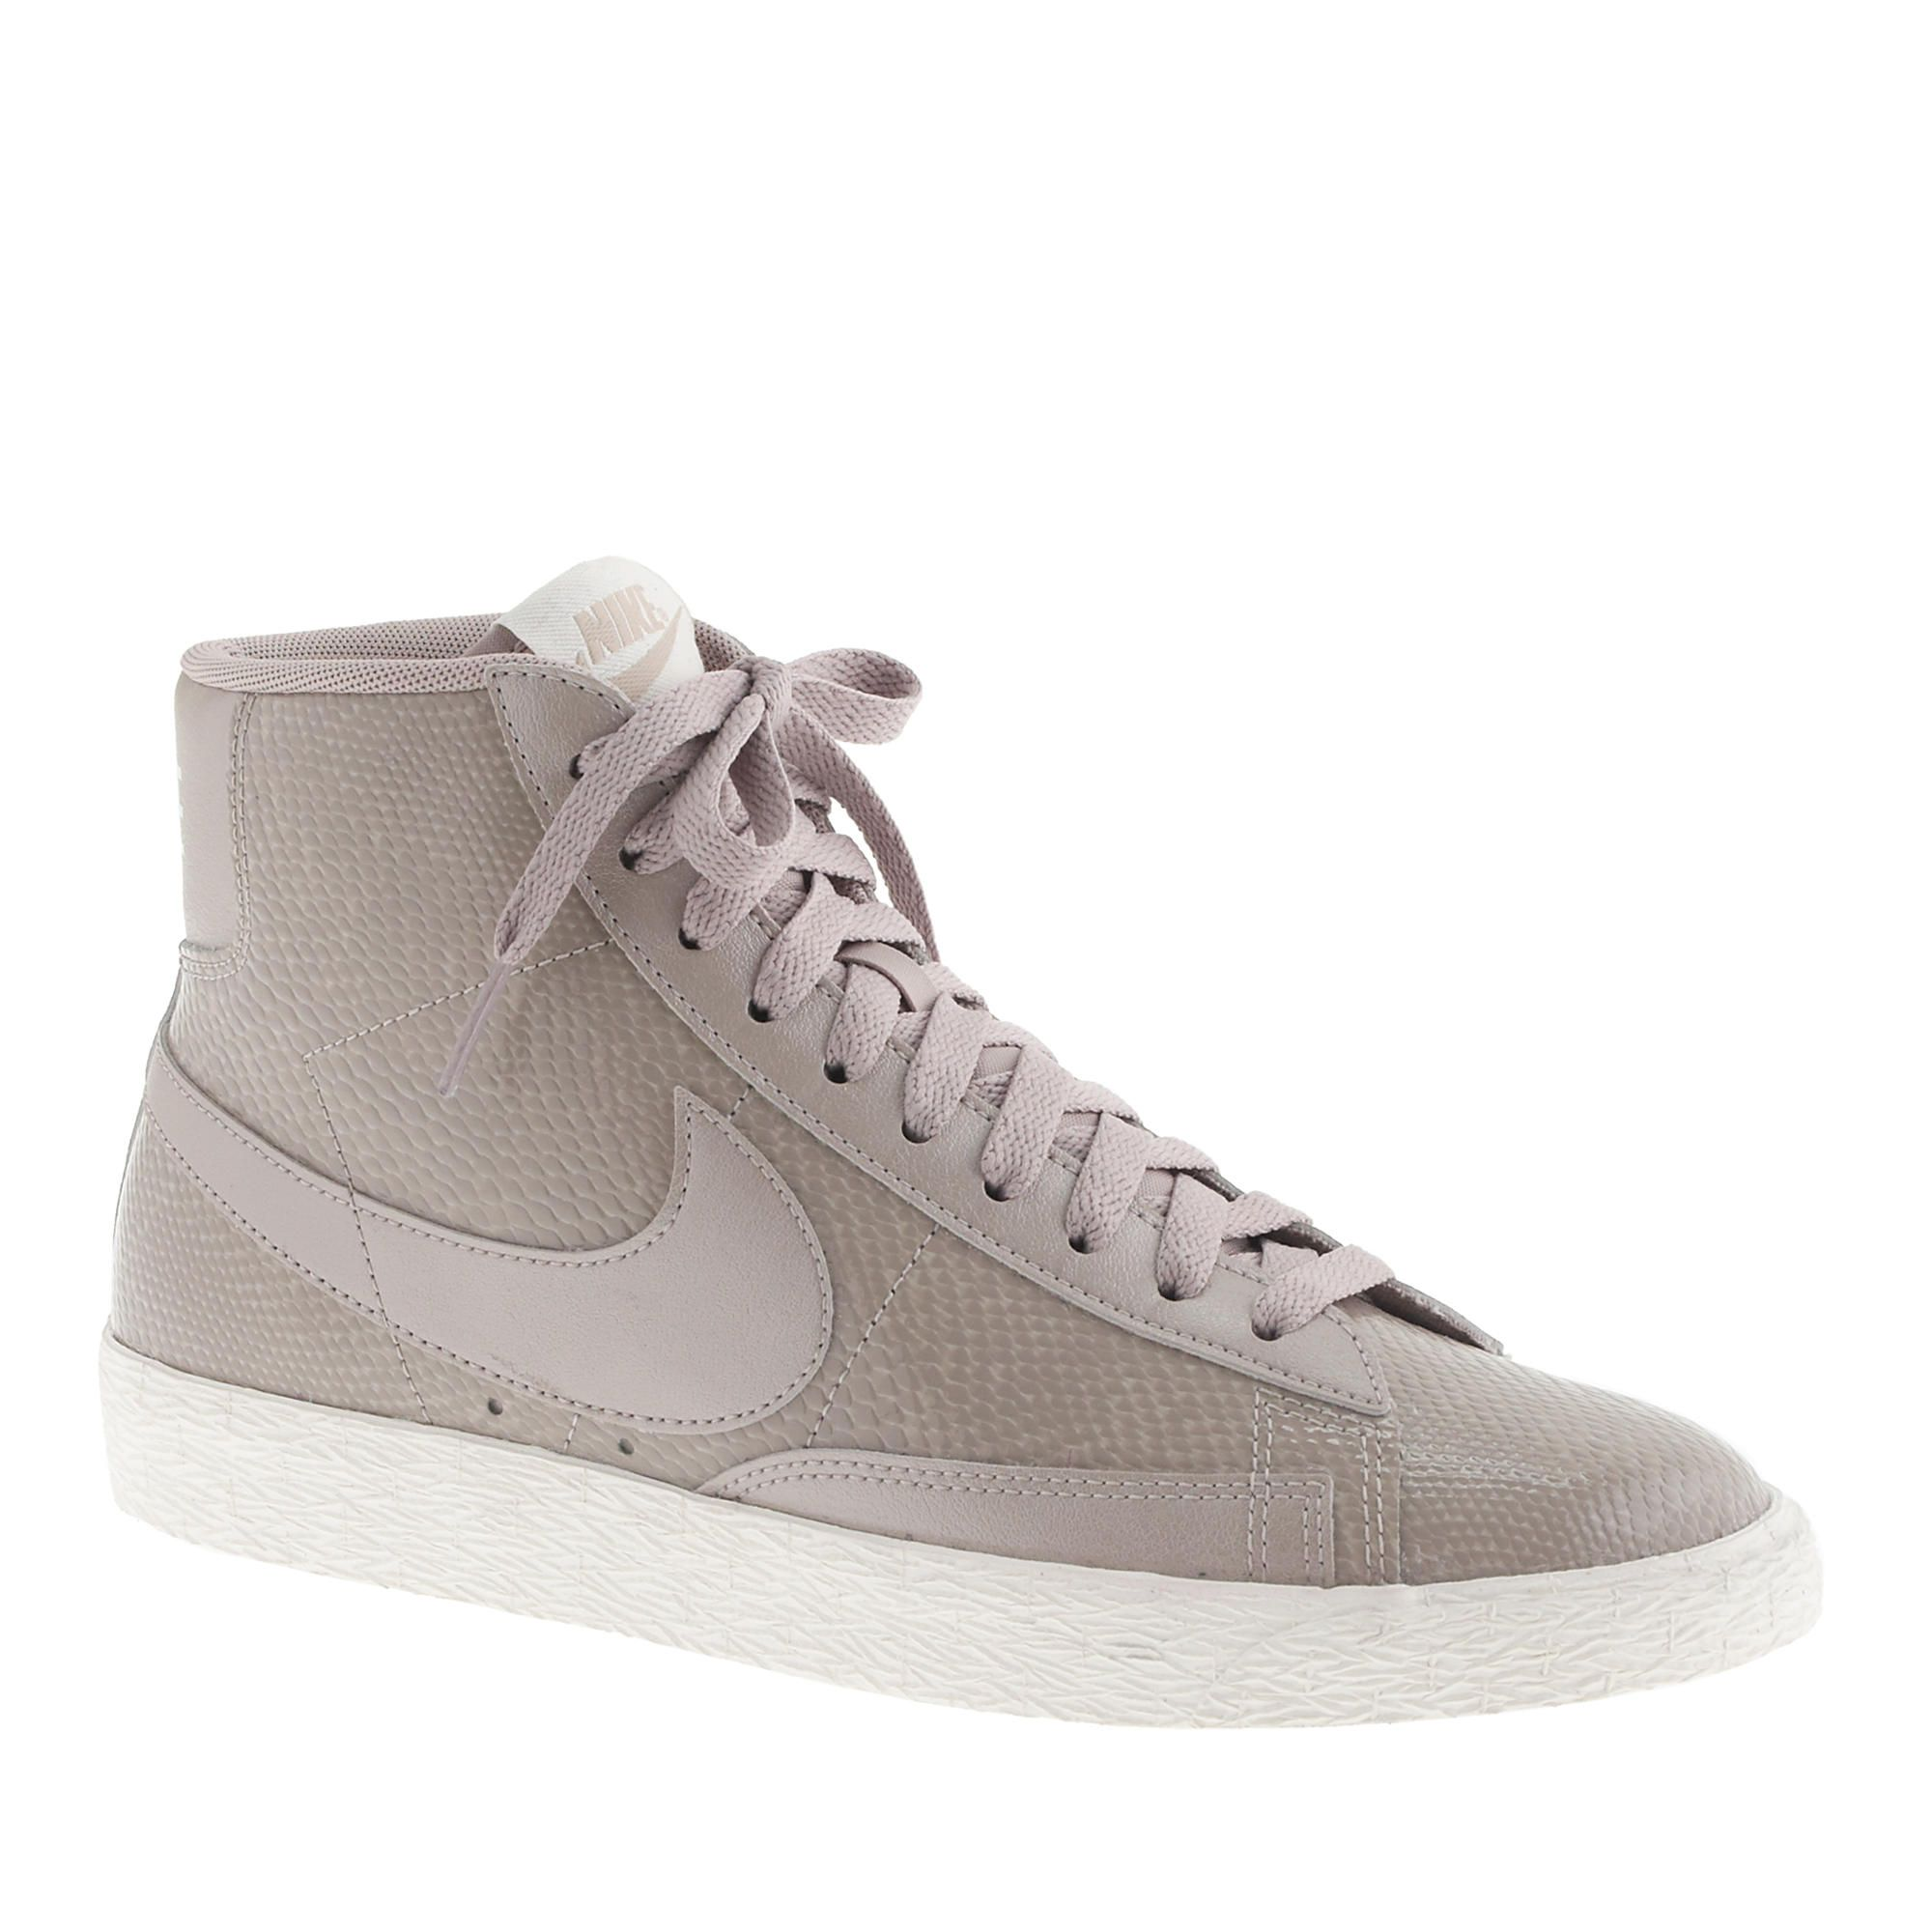 Women's Nike Blazer mid vintage sneakers : Nike | J.Crew Pink/mauve LOVE